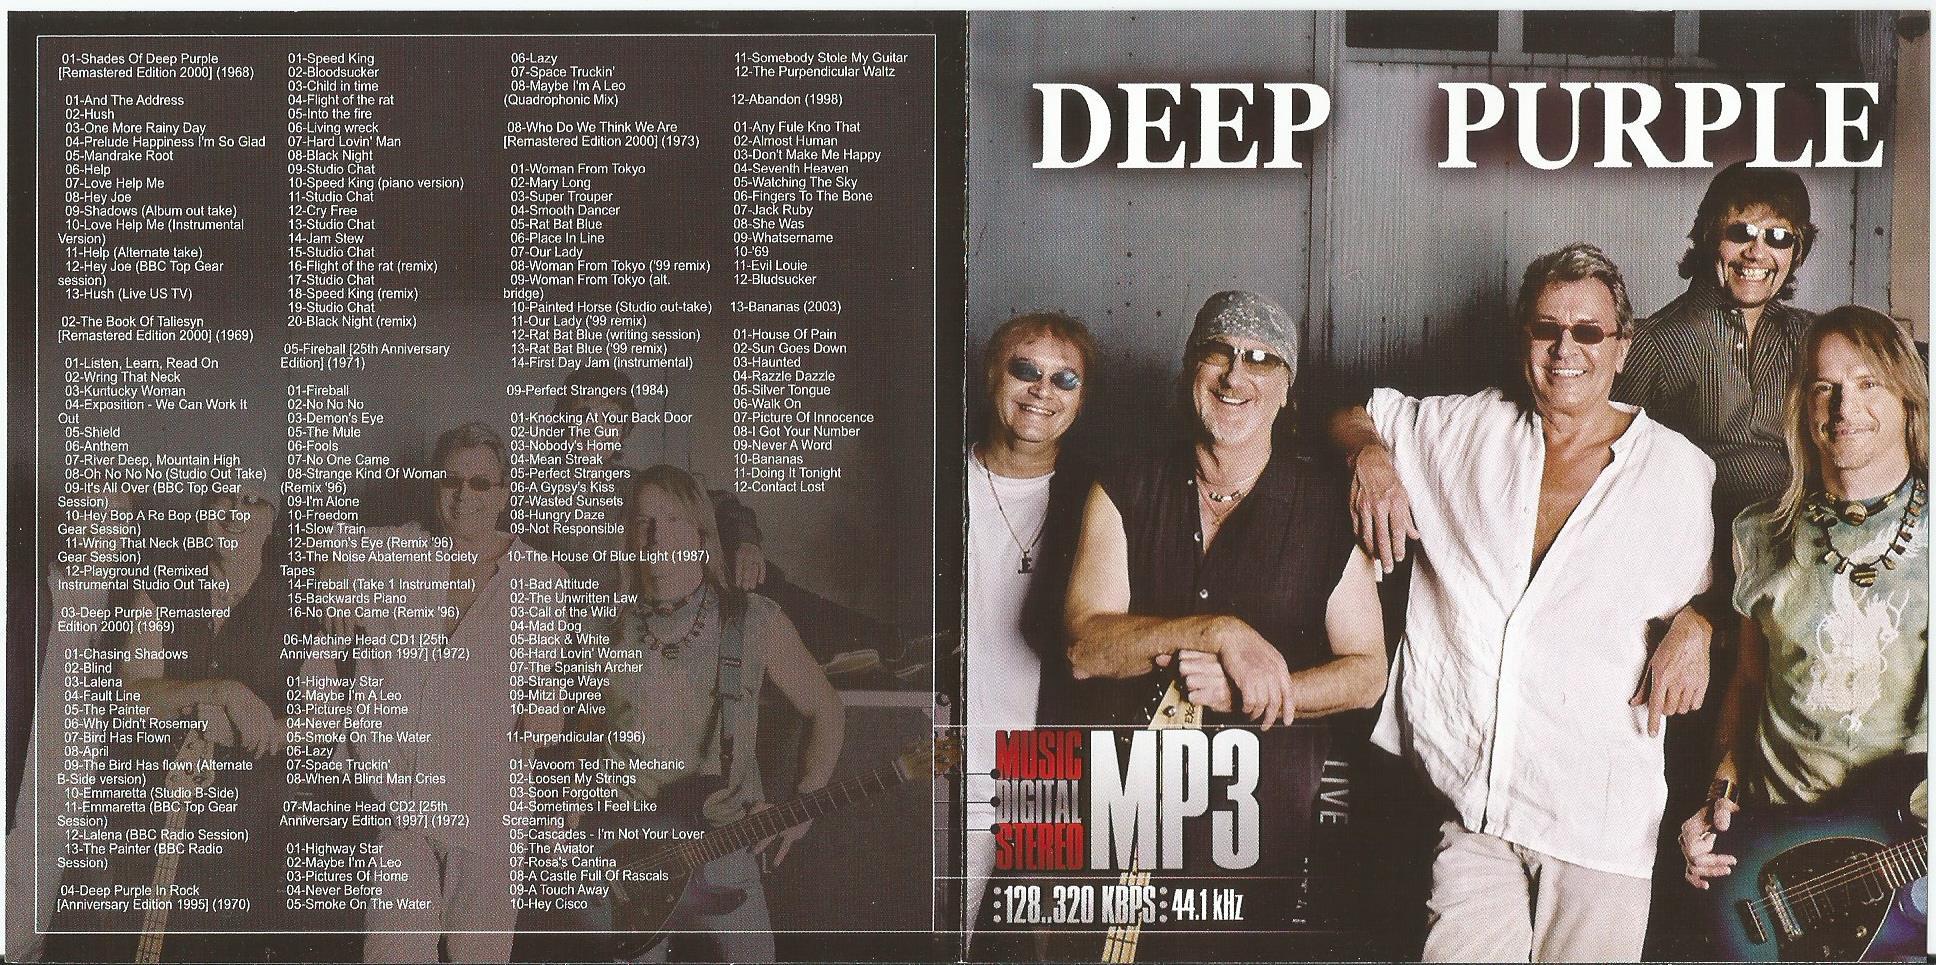 Deep Purple Shades of deep purple (Vinyl Records, LP, CD) on